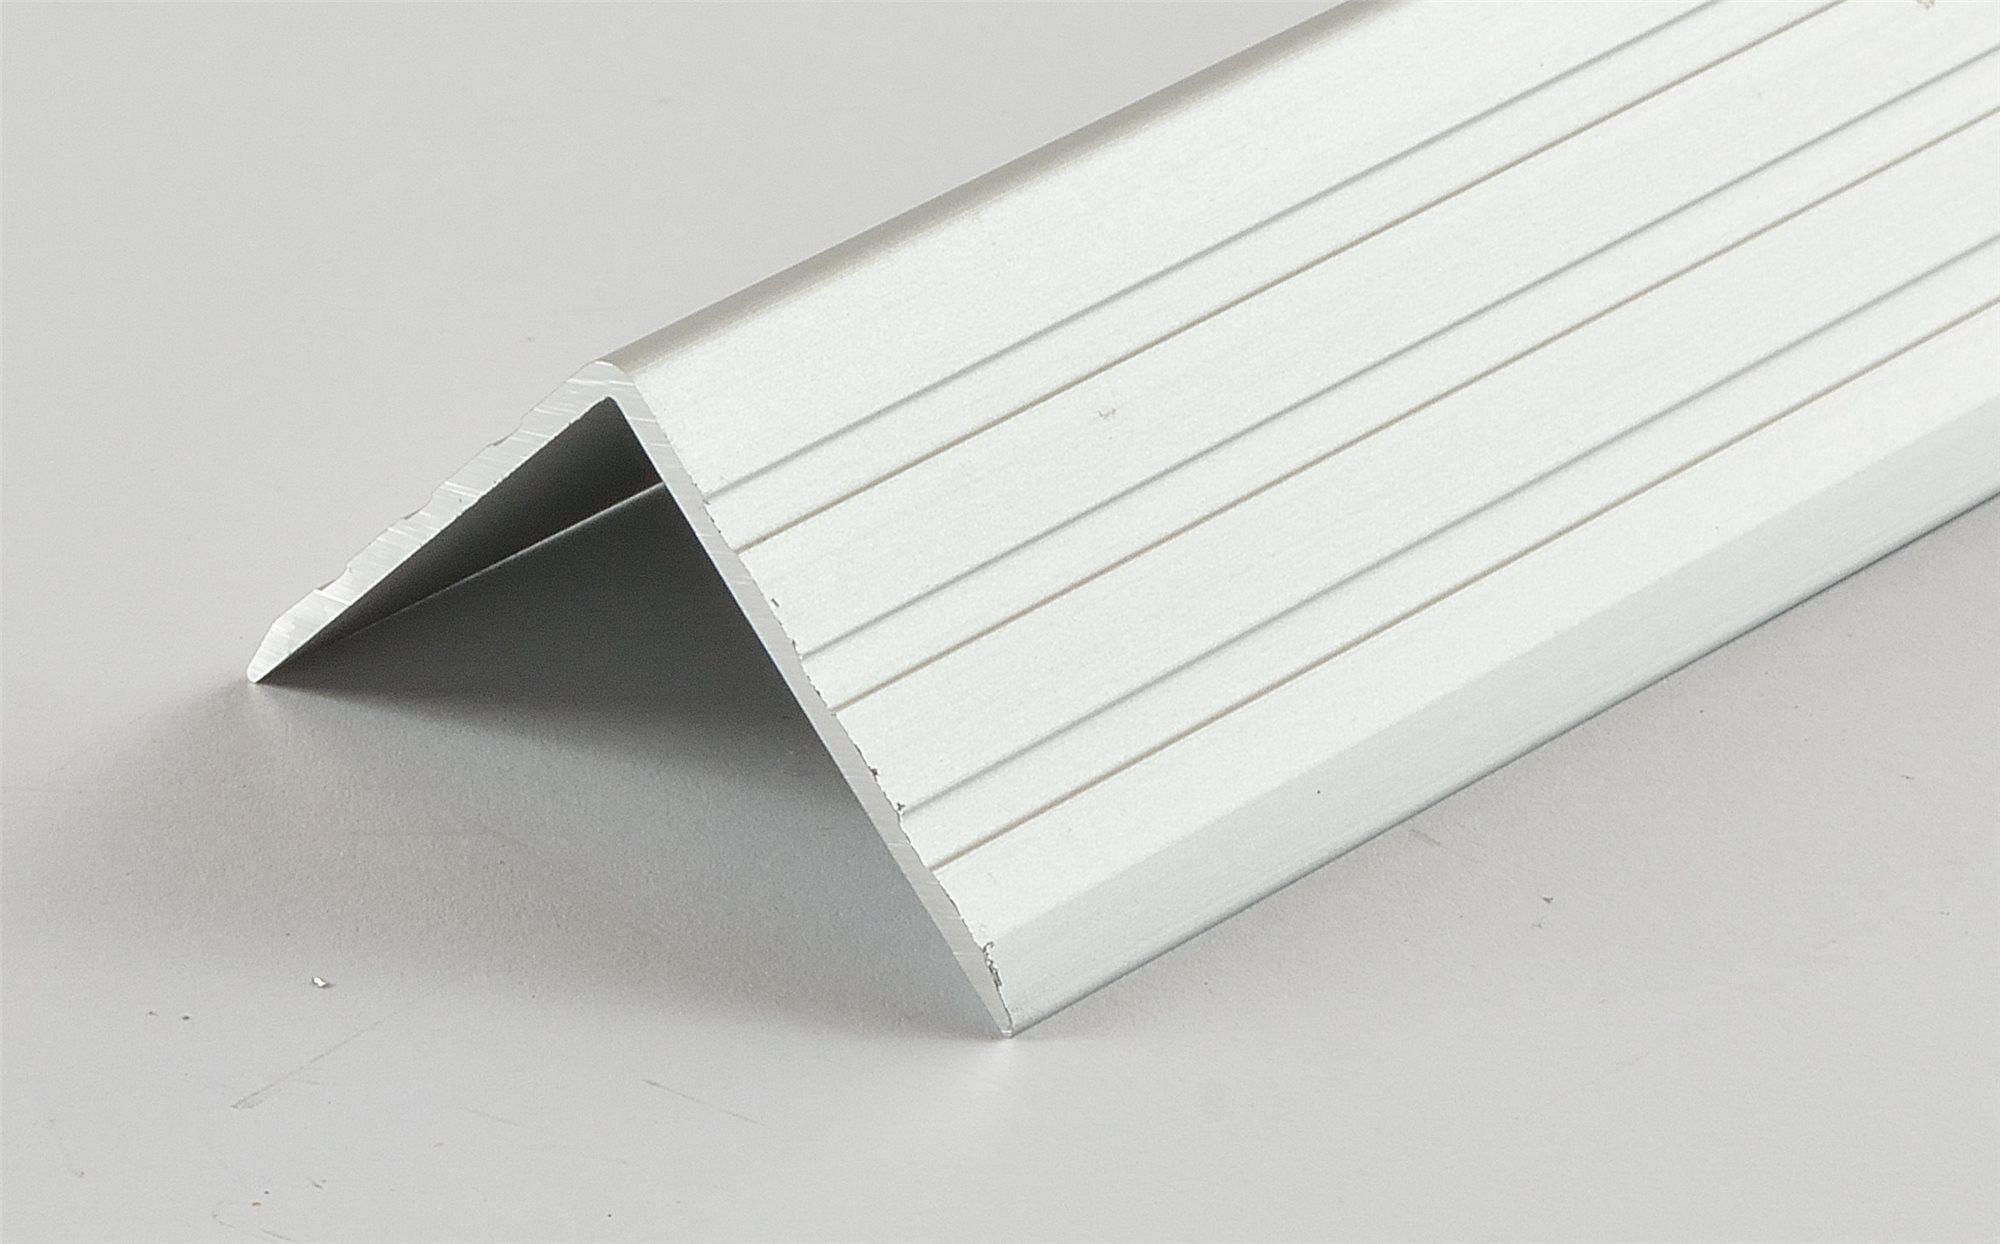 kantenschutz 30x30x1 5mm aluminium eloxiert winkelprofil 14010. Black Bedroom Furniture Sets. Home Design Ideas